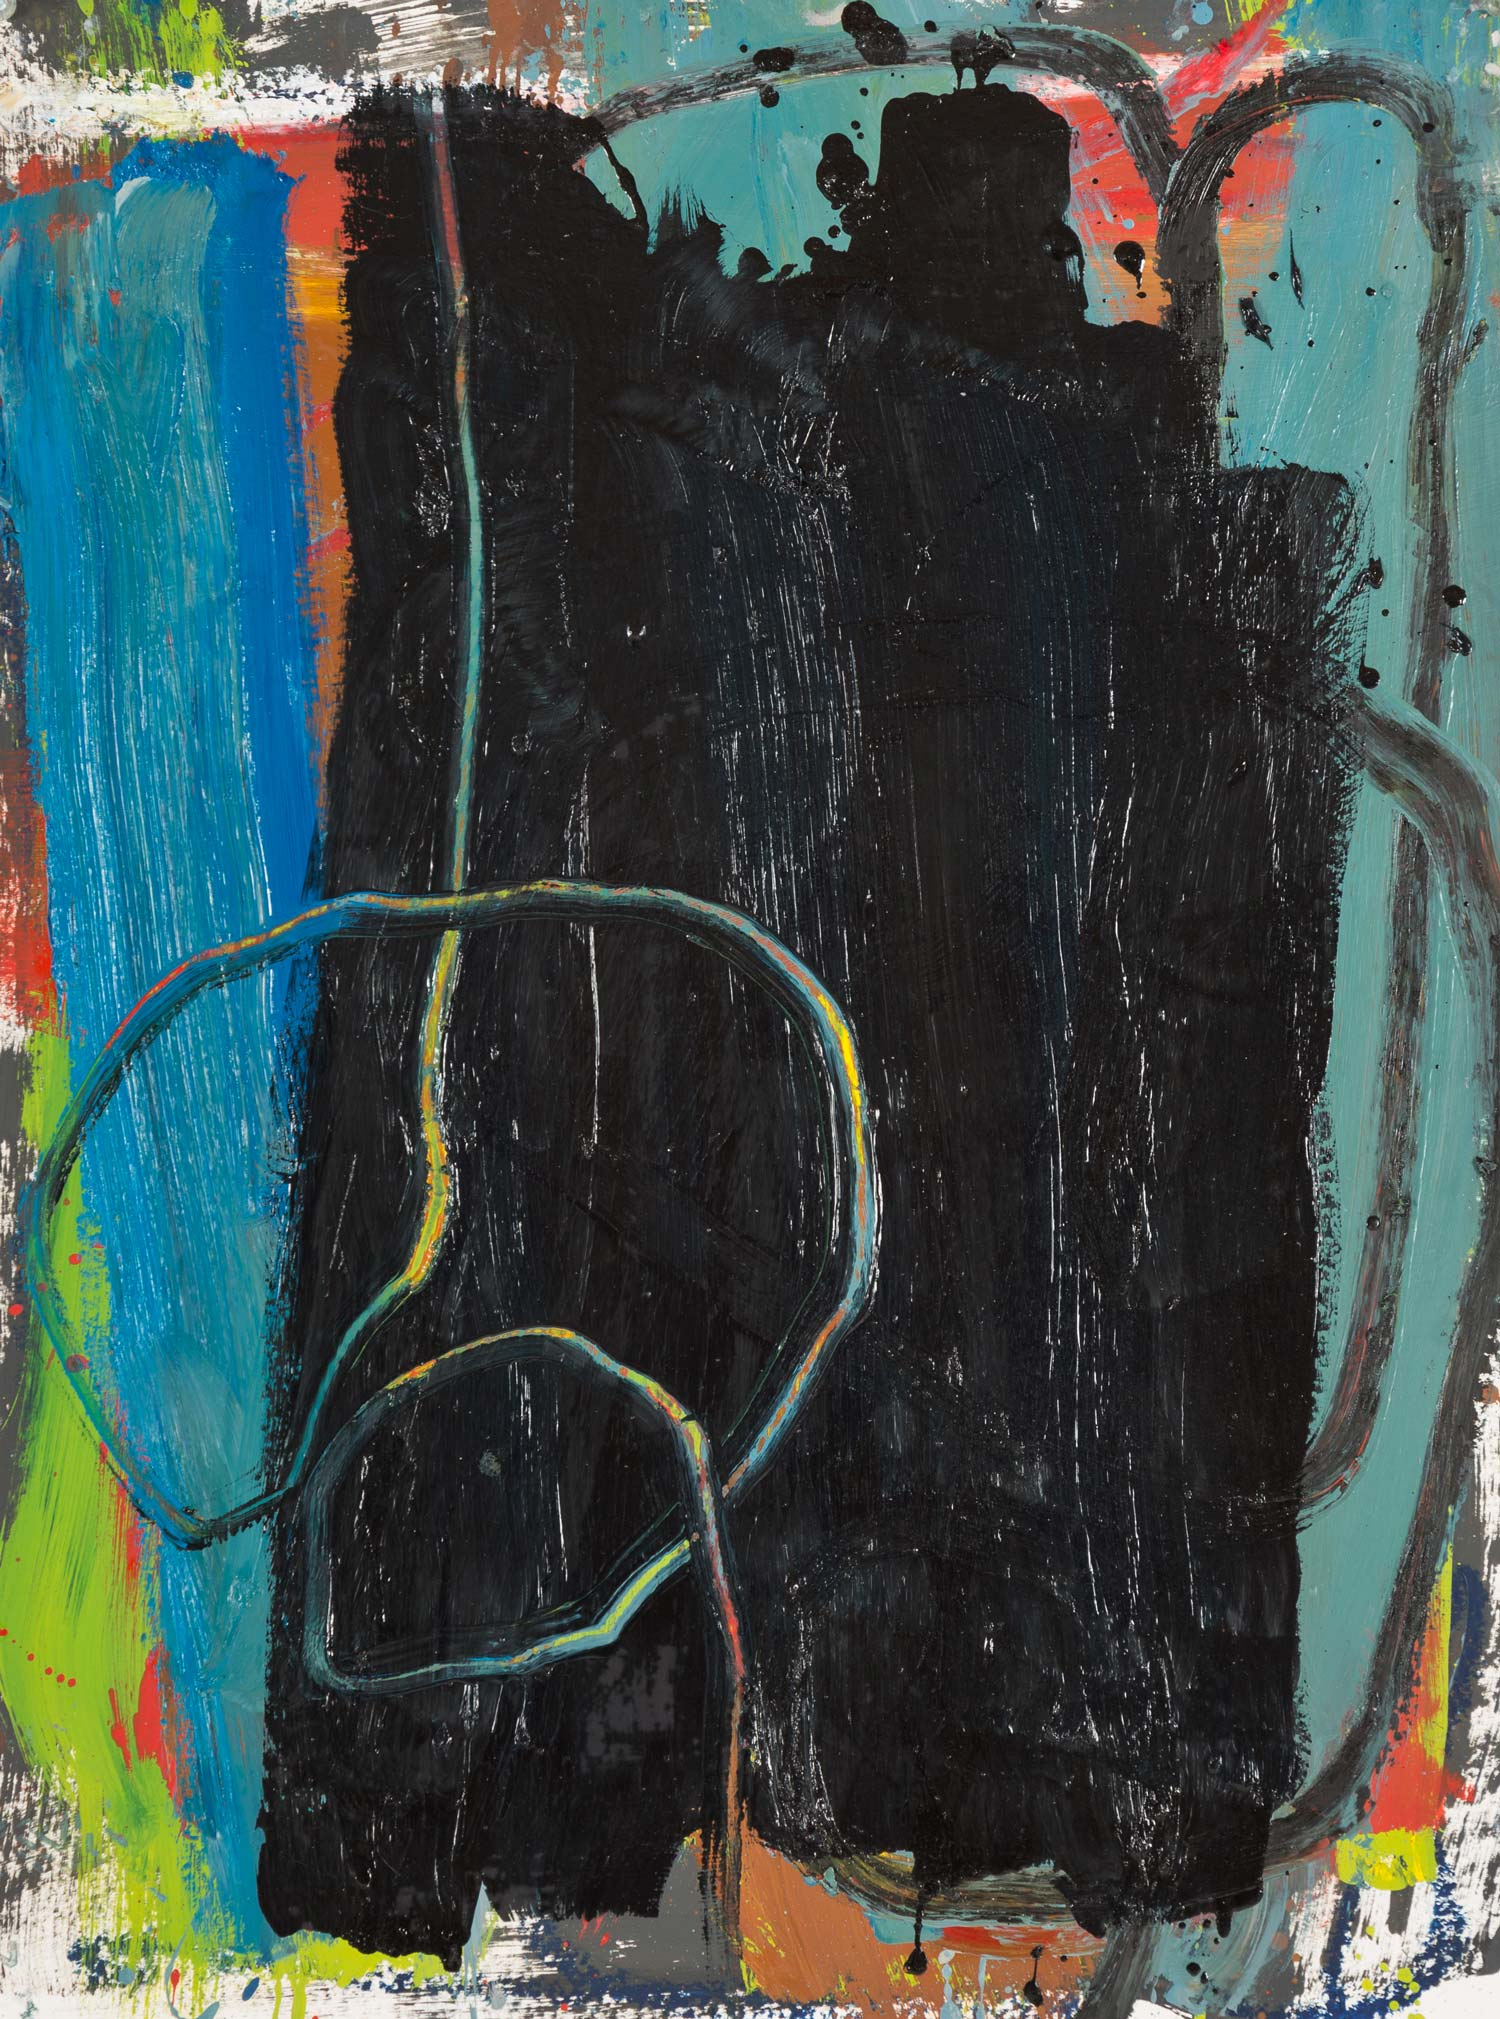 Black Heart  , oil on paper, 24x18 in. ©Denise Gale 2013